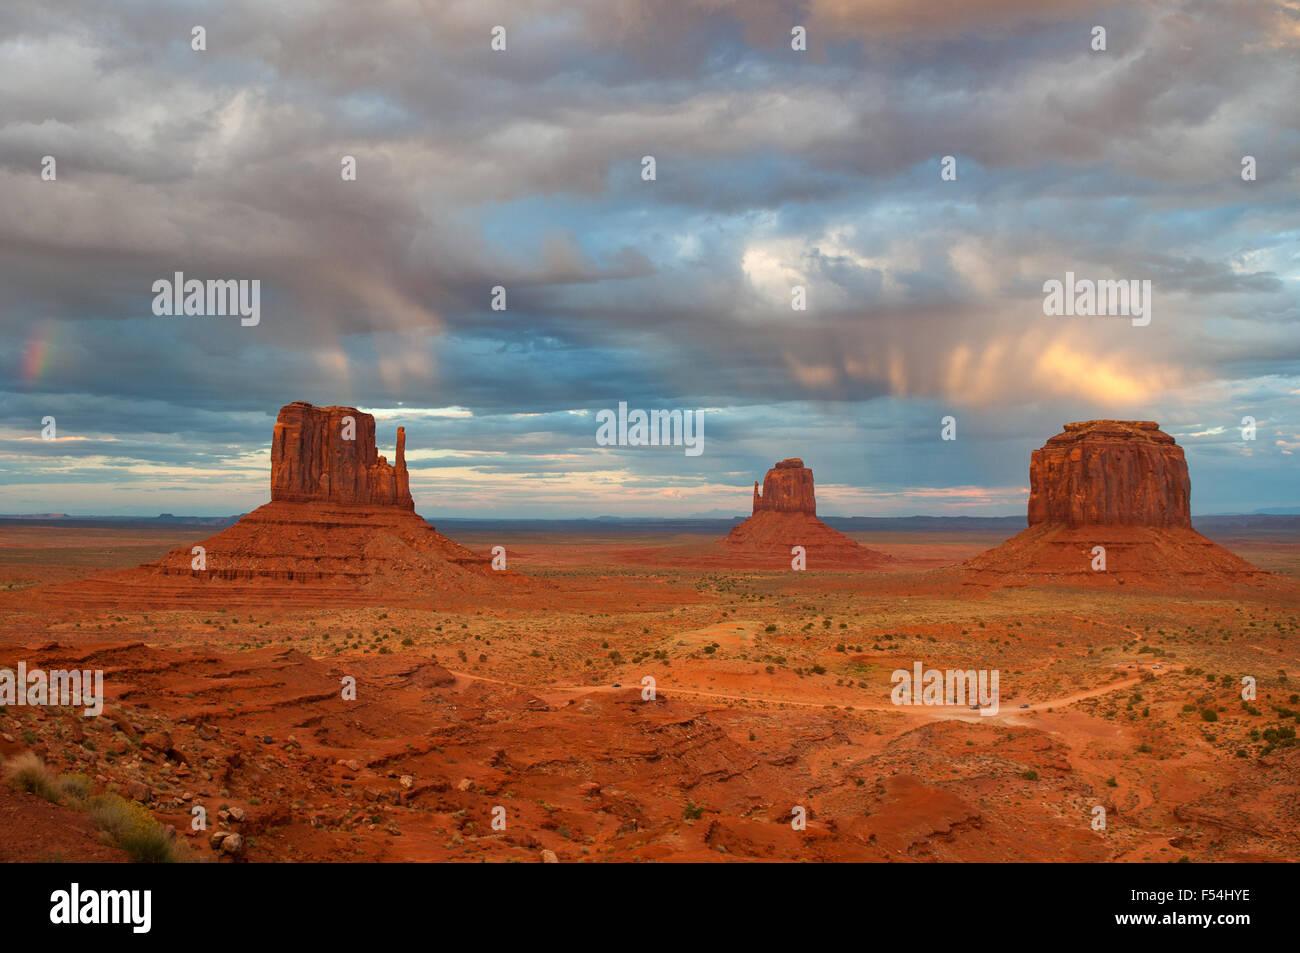 Rainstorm over Monument Valley, Arizona, USA - Stock Image